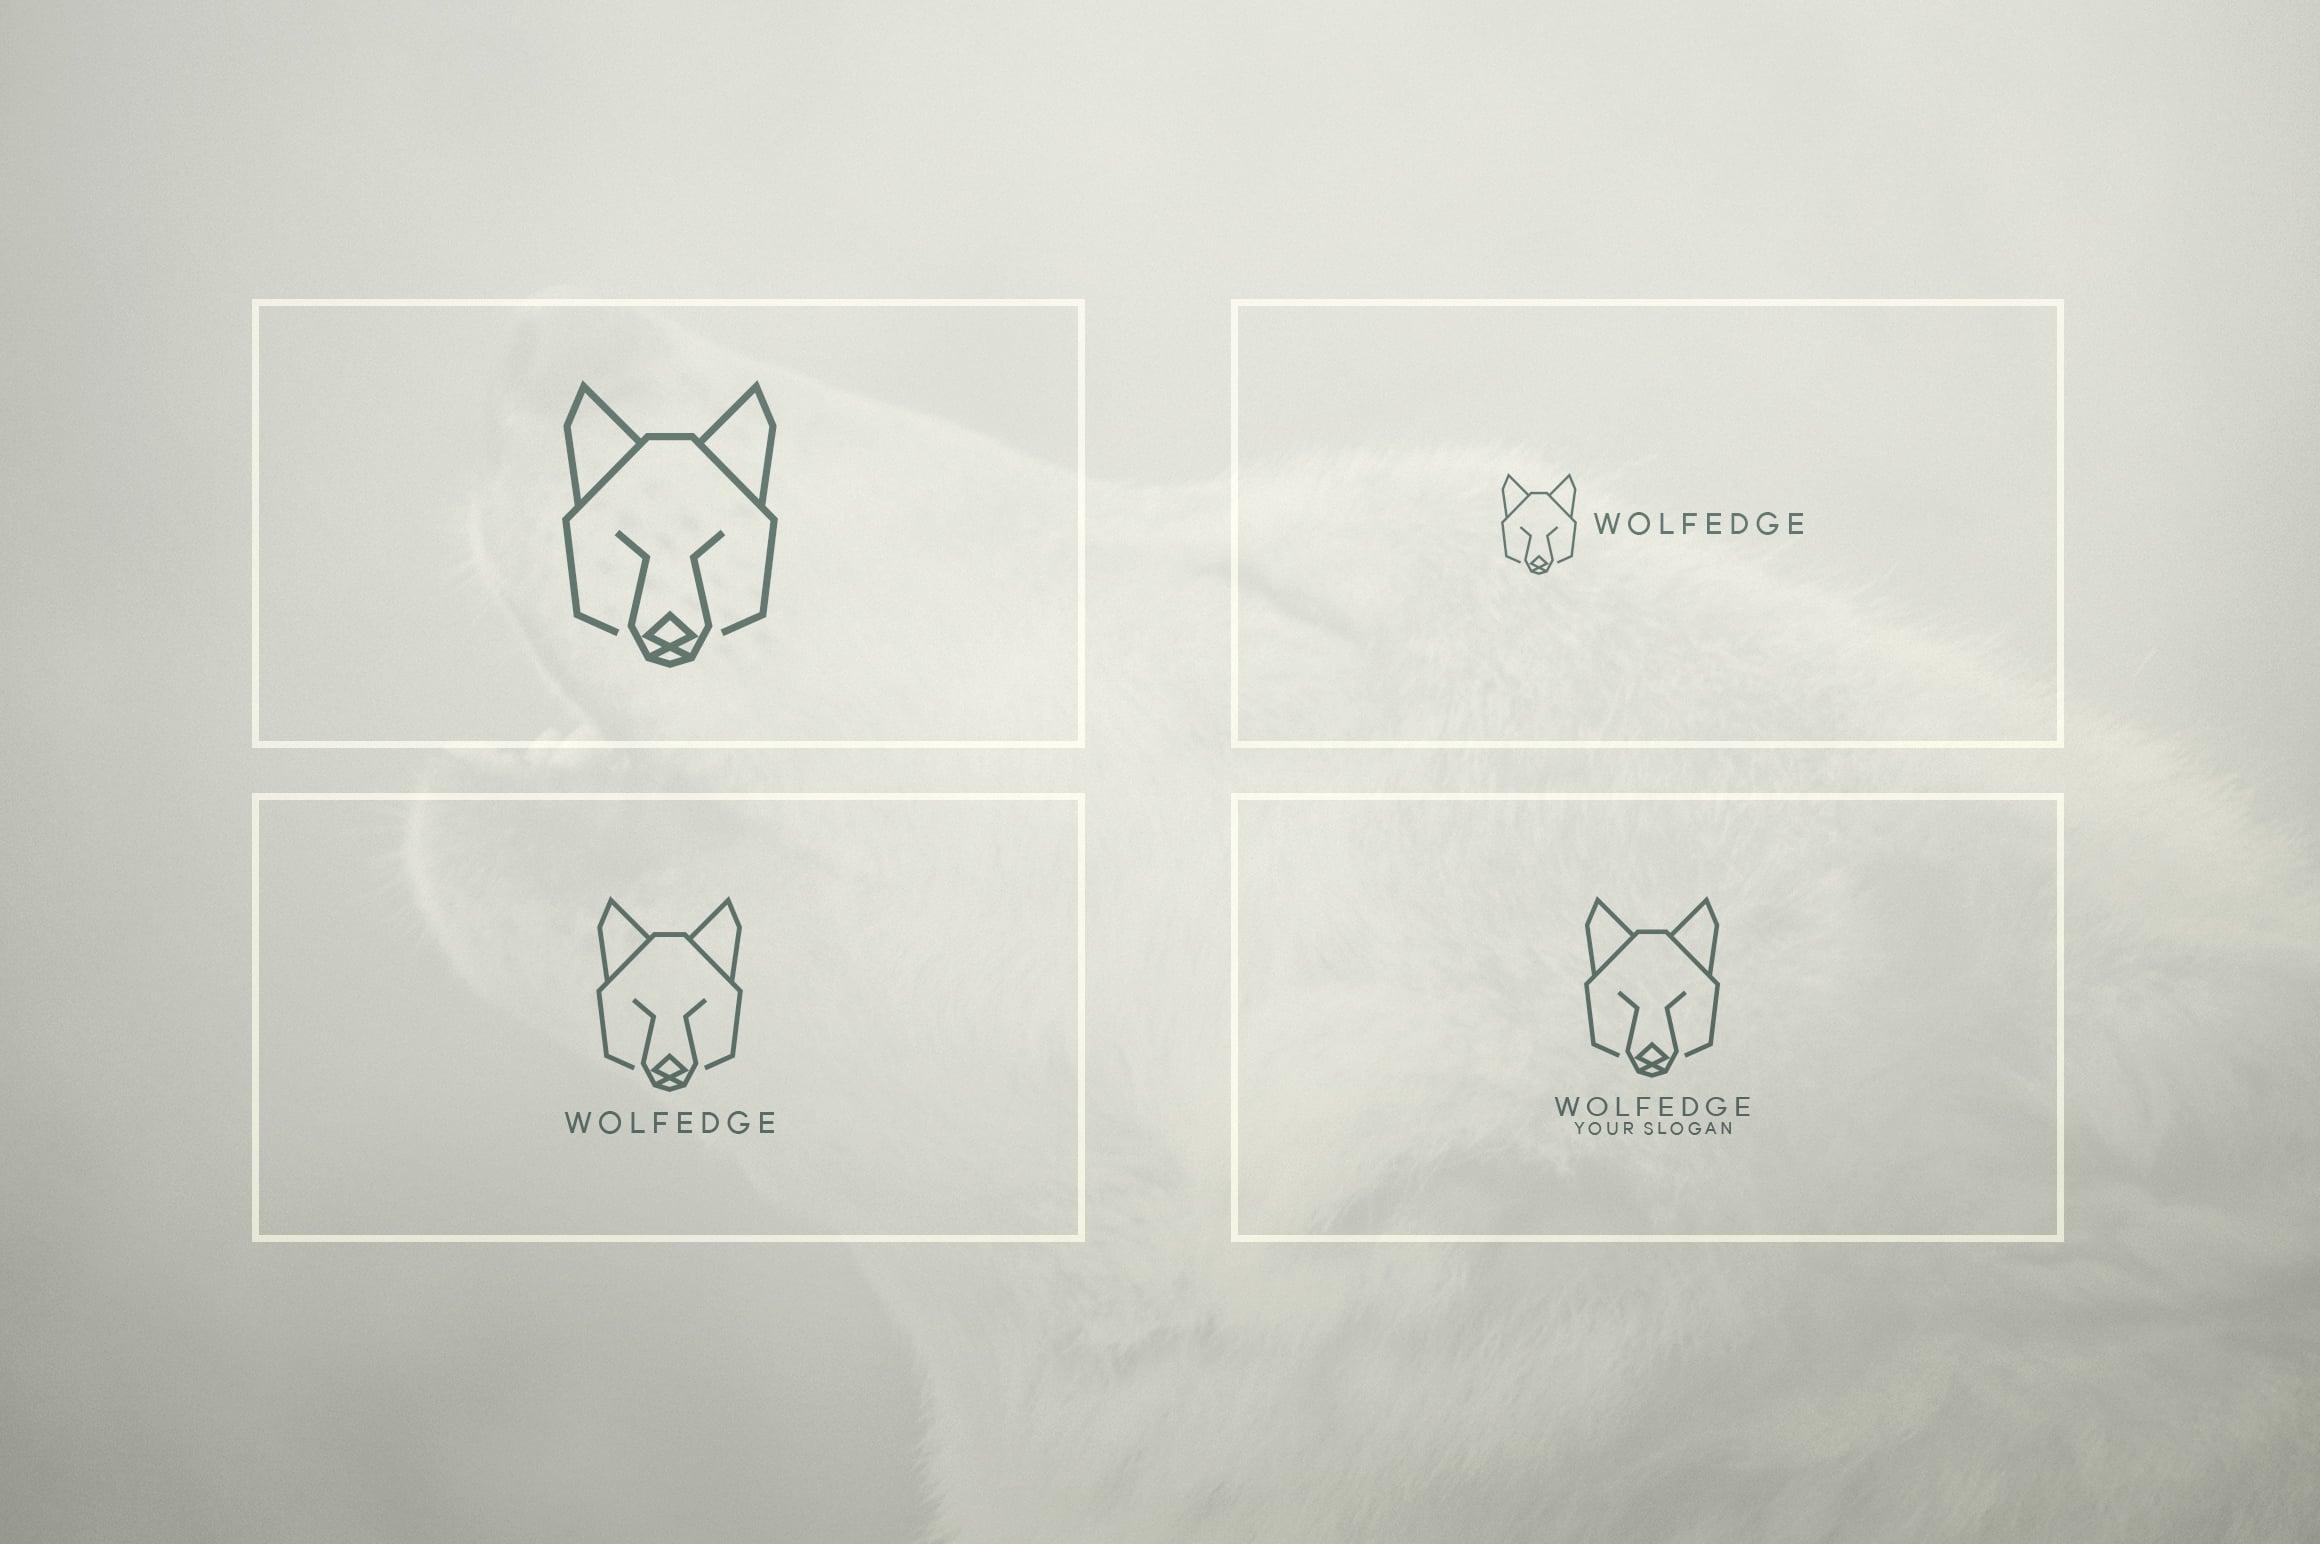 17 Geometric Animal Icons and Logos - 25